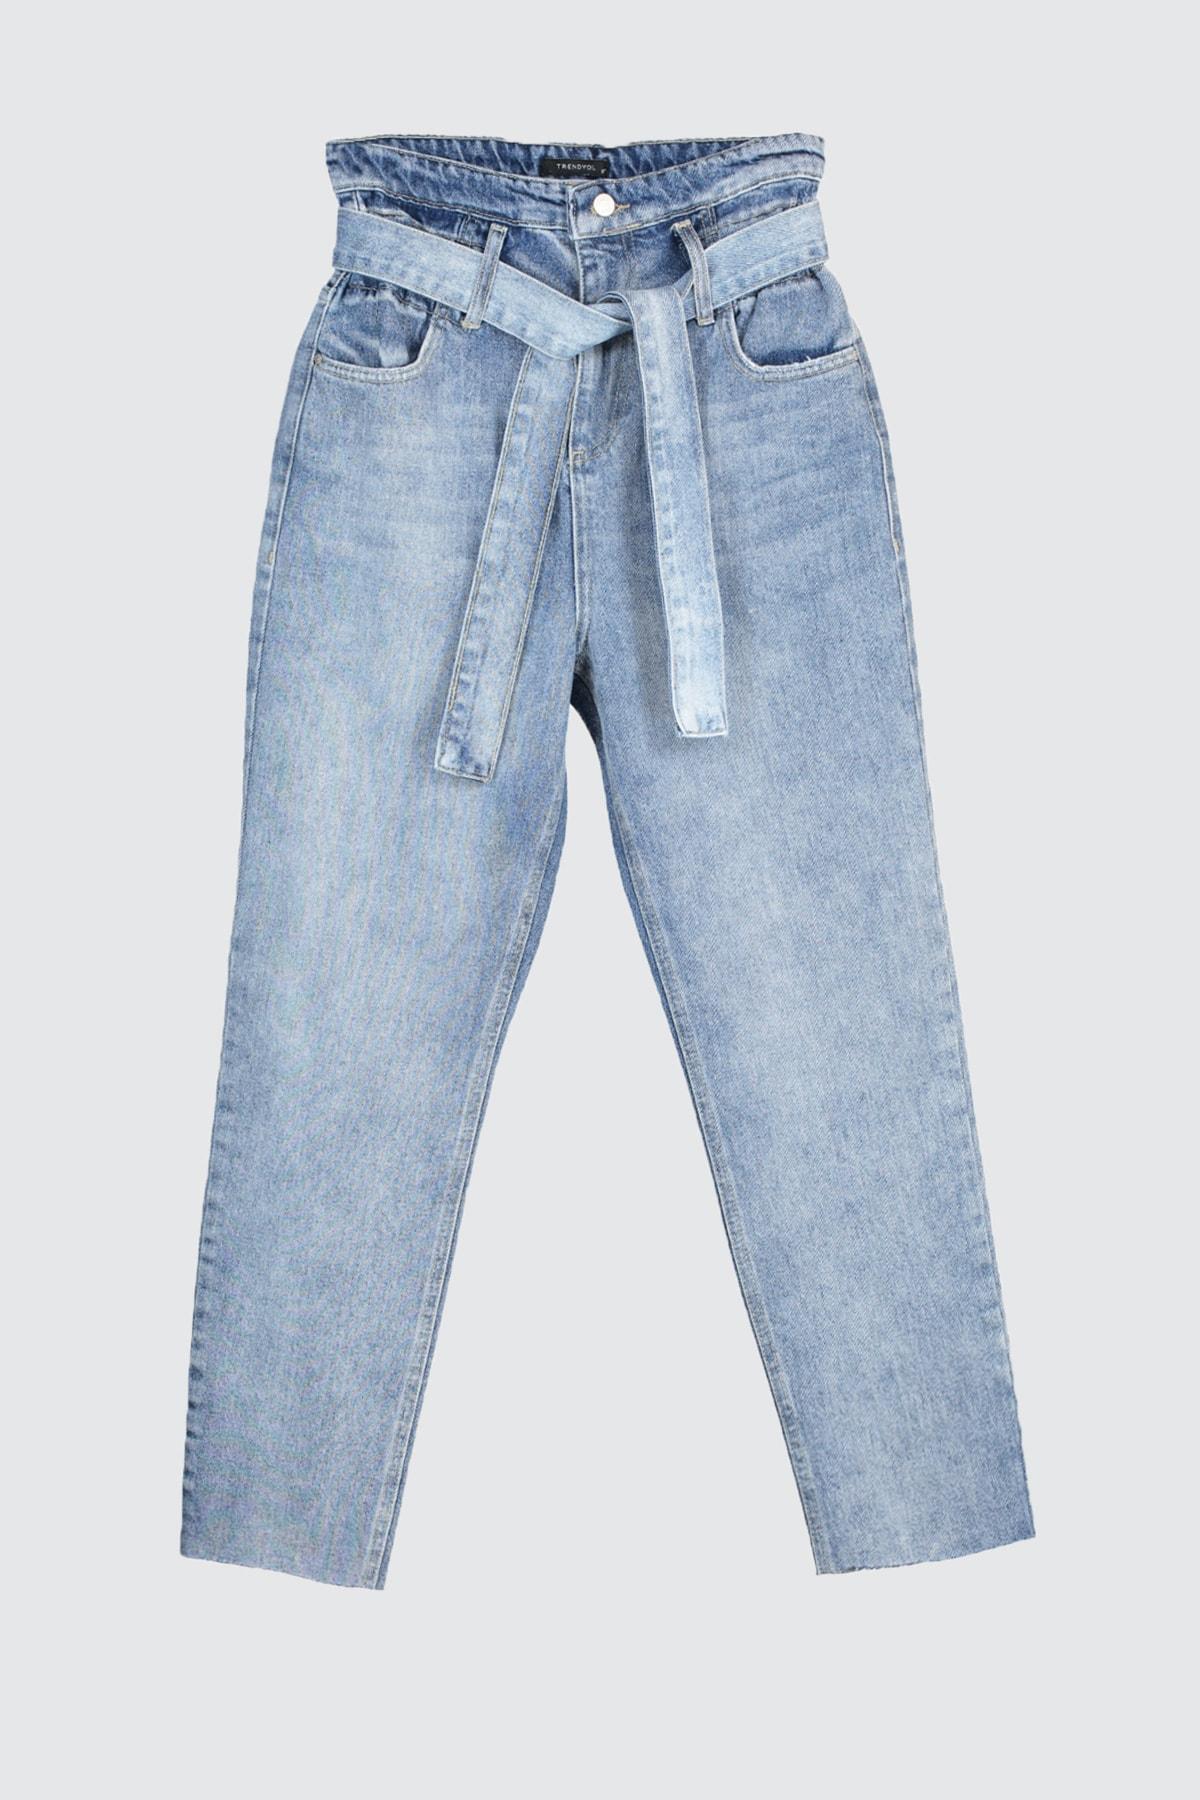 Trendyol Arched Super High Waist Mom Jeans TWOSS20JE0352